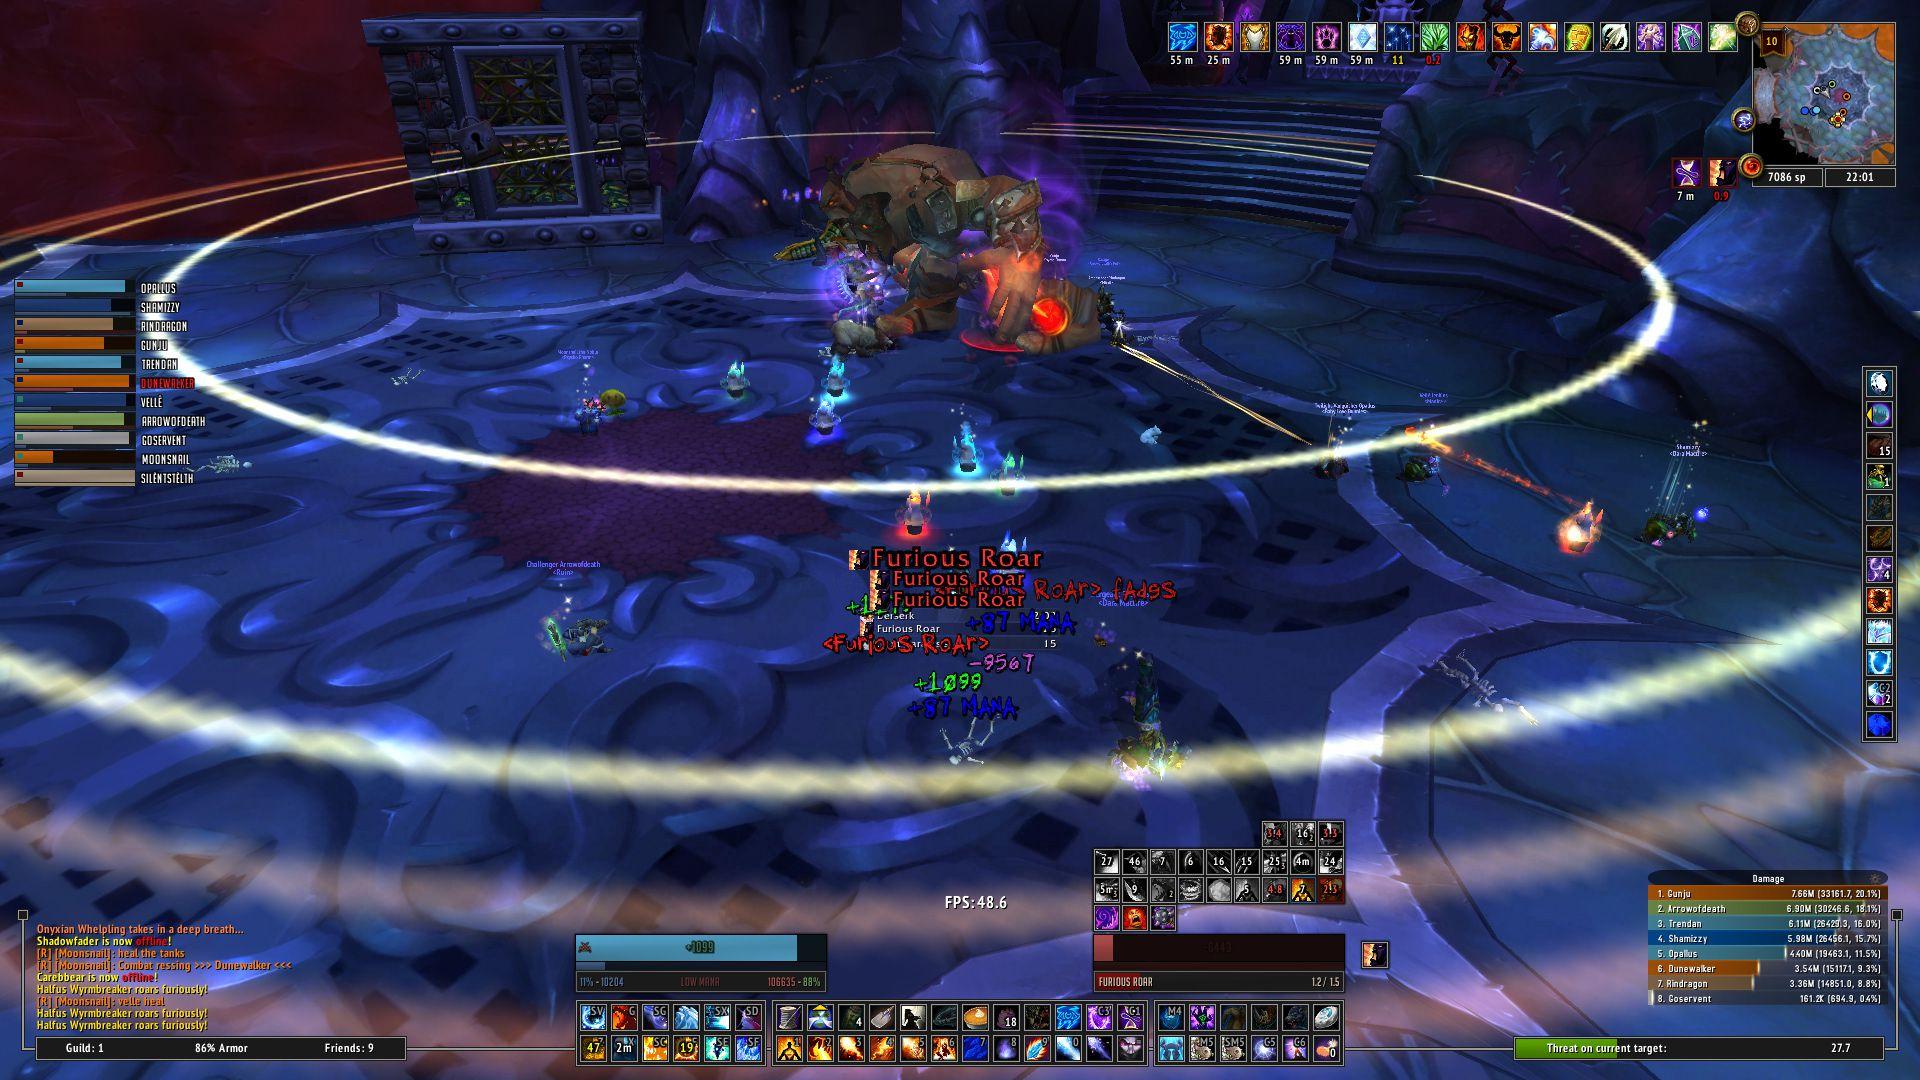 My mage UI wow screenshot - Gamingcfg com